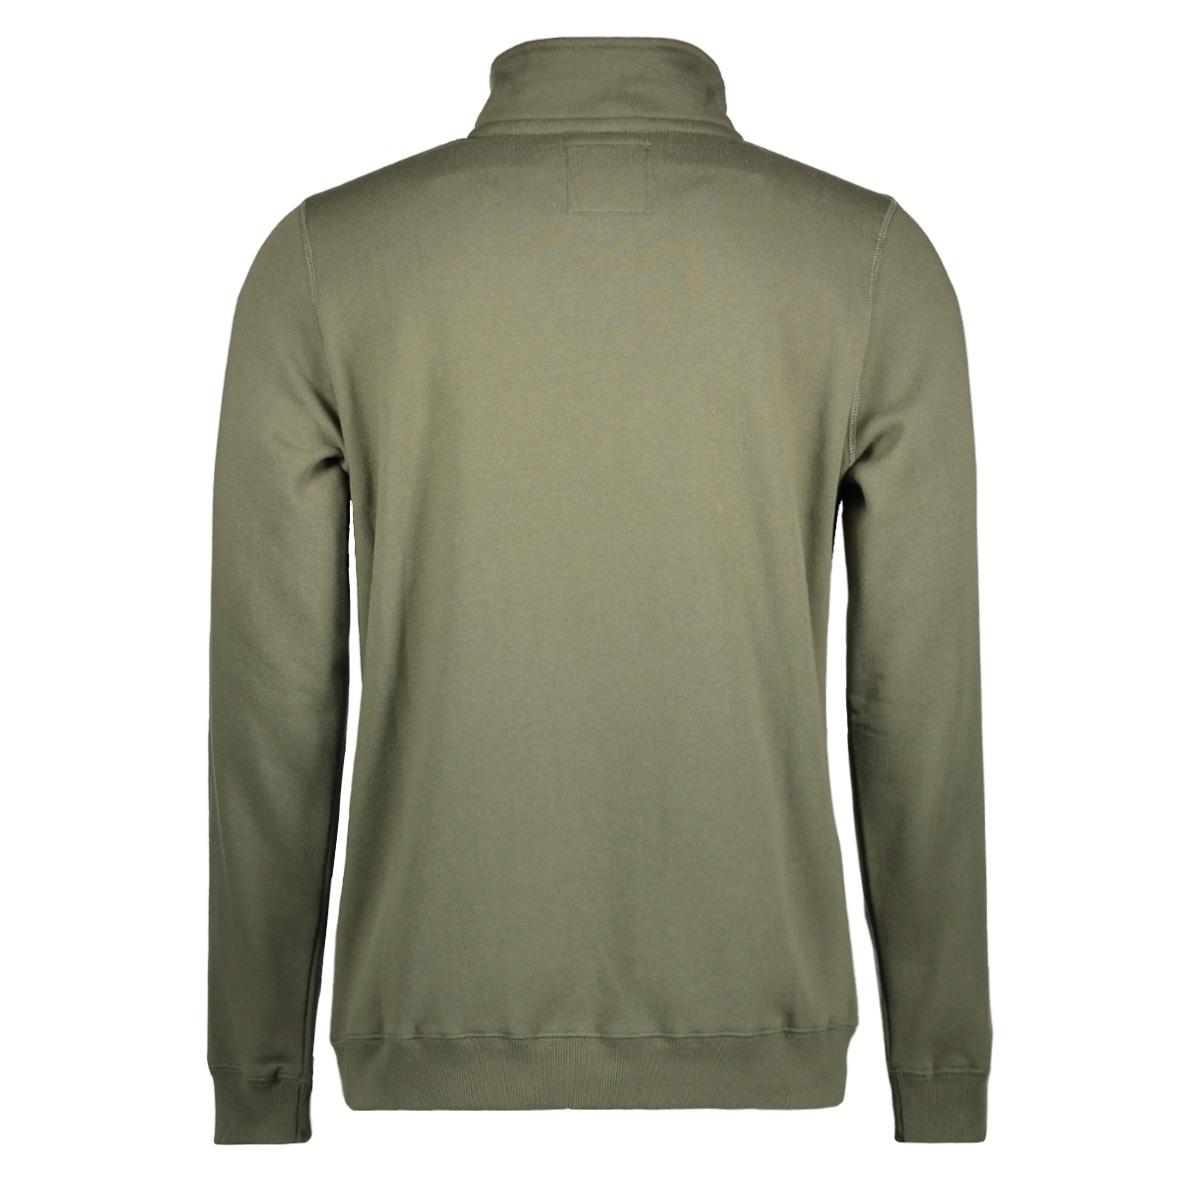 msw771400 twinlife sweater beetle